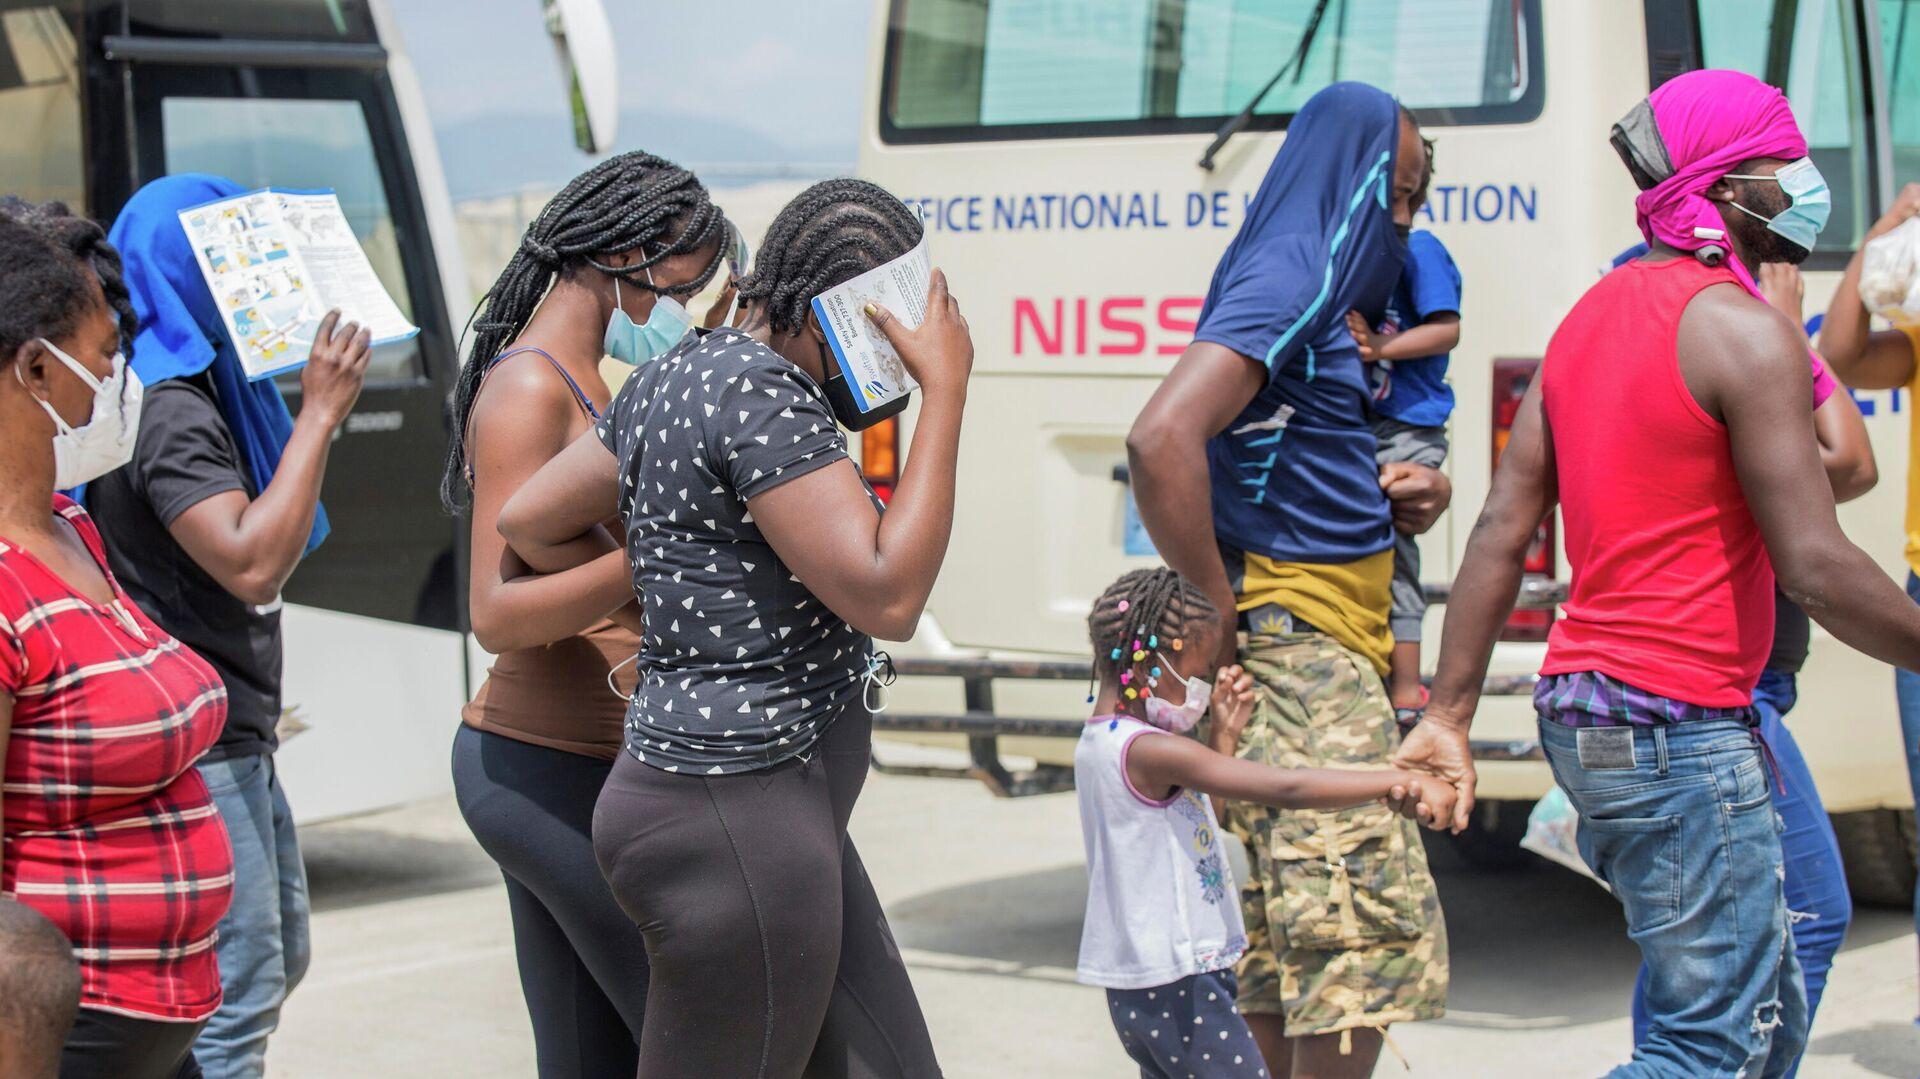 Migrantes haitianos - Sputnik Mundo, 1920, 01.10.2021